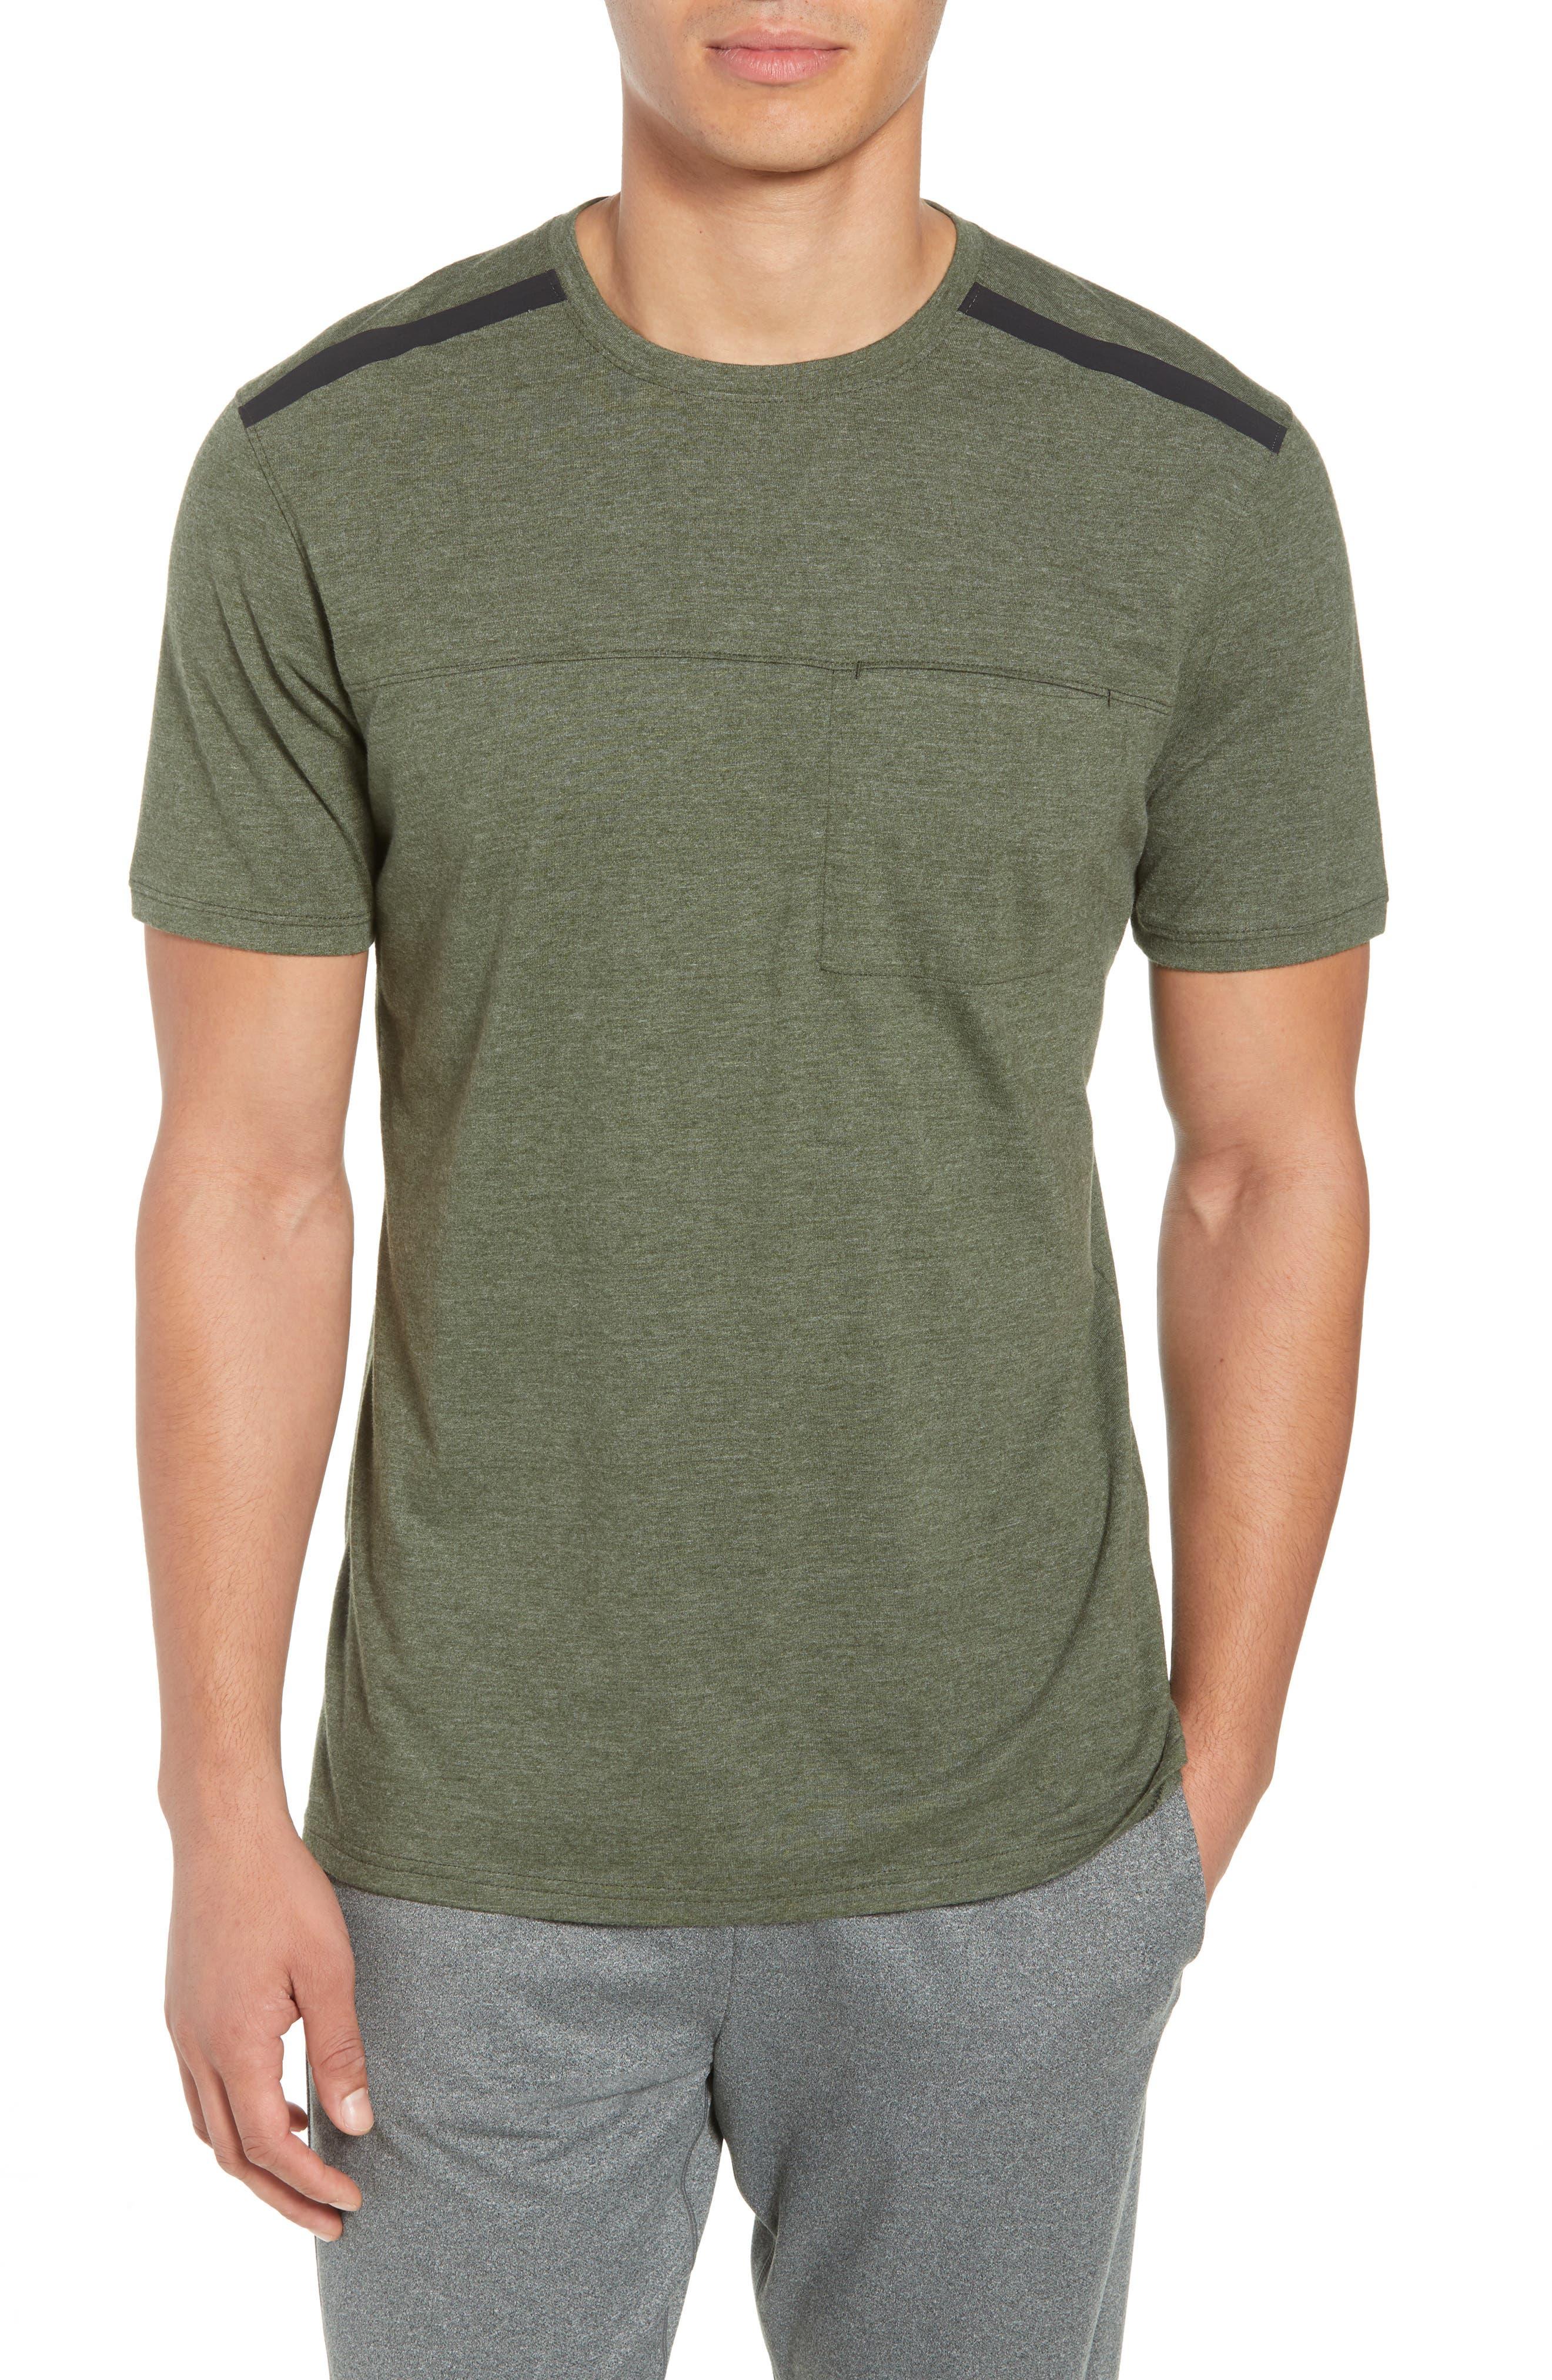 Zella Perfomance T-Shirt